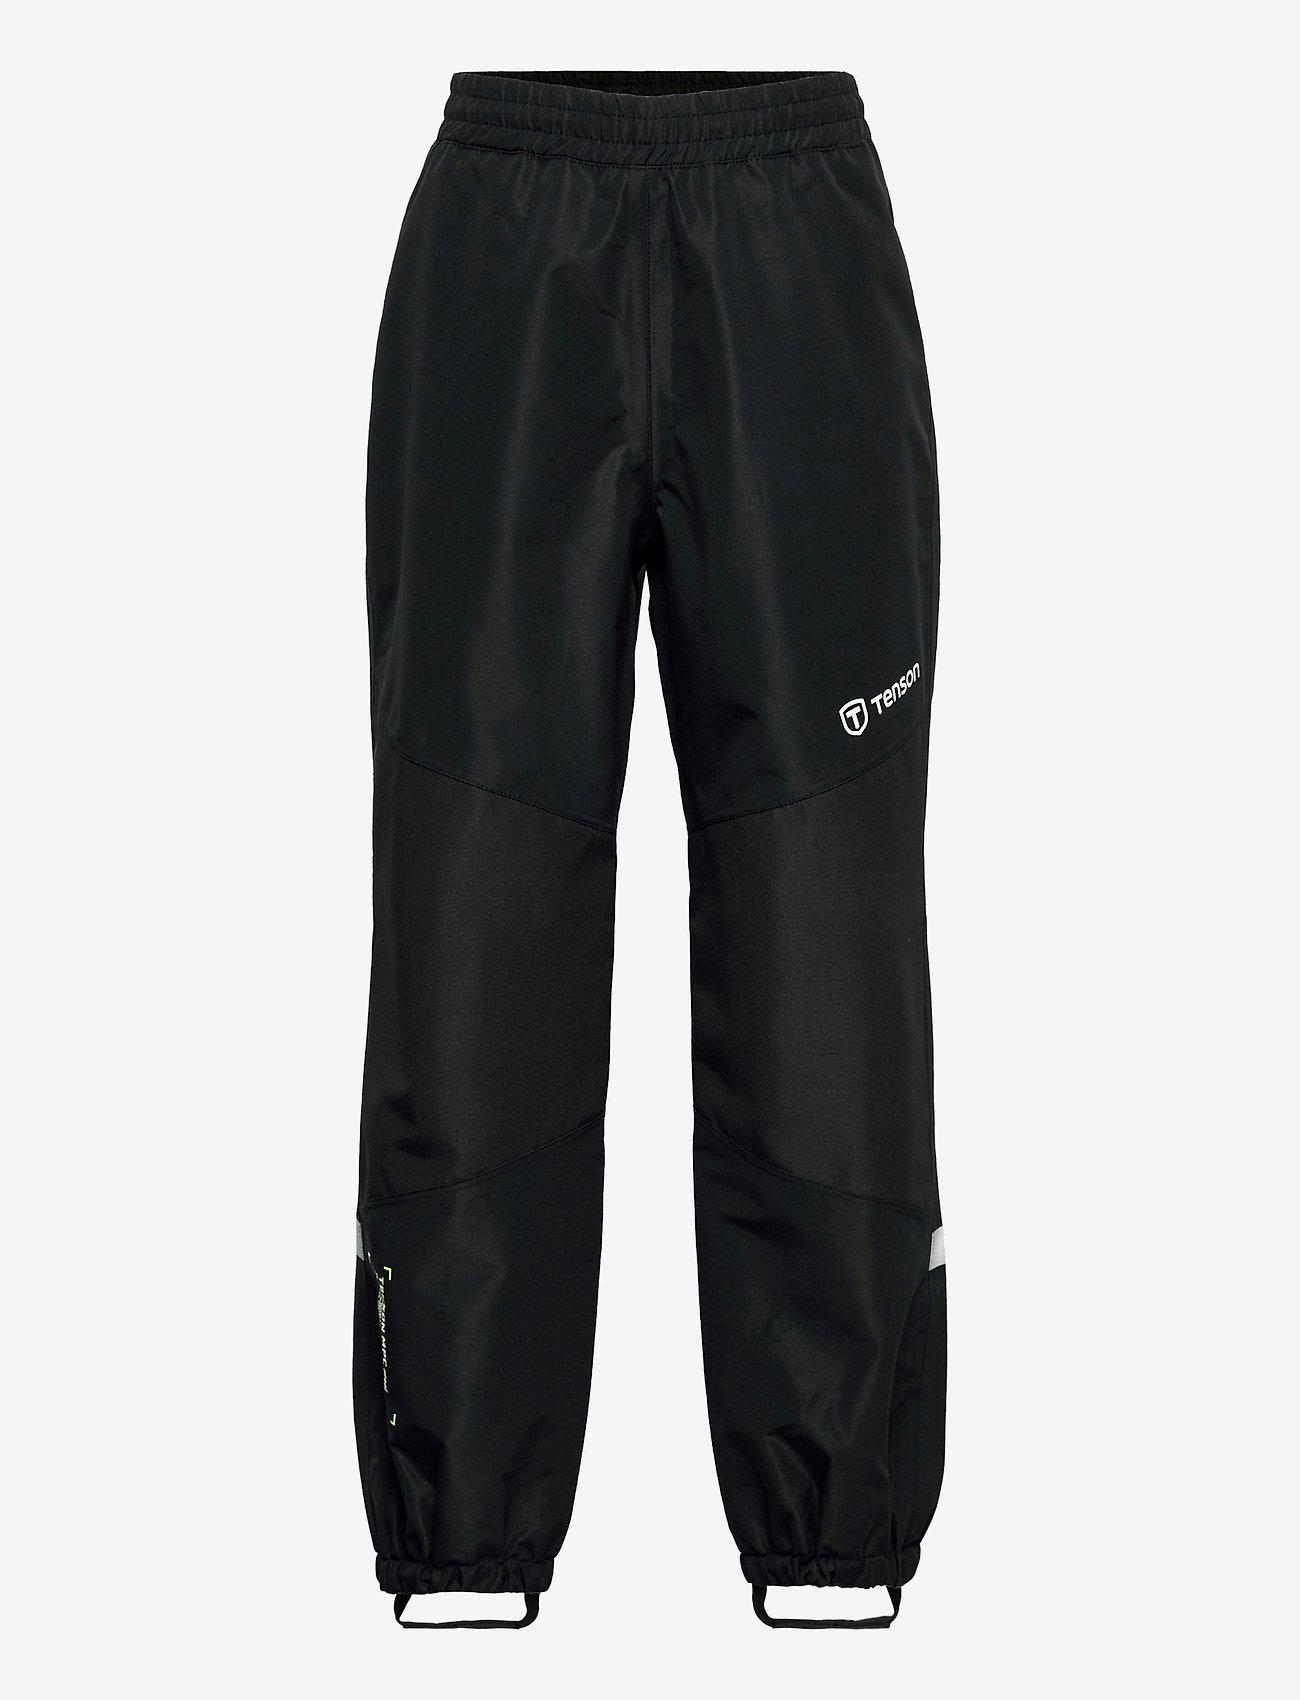 Tenson - Shore pants jr - shell- & regenbroeken - black - 0